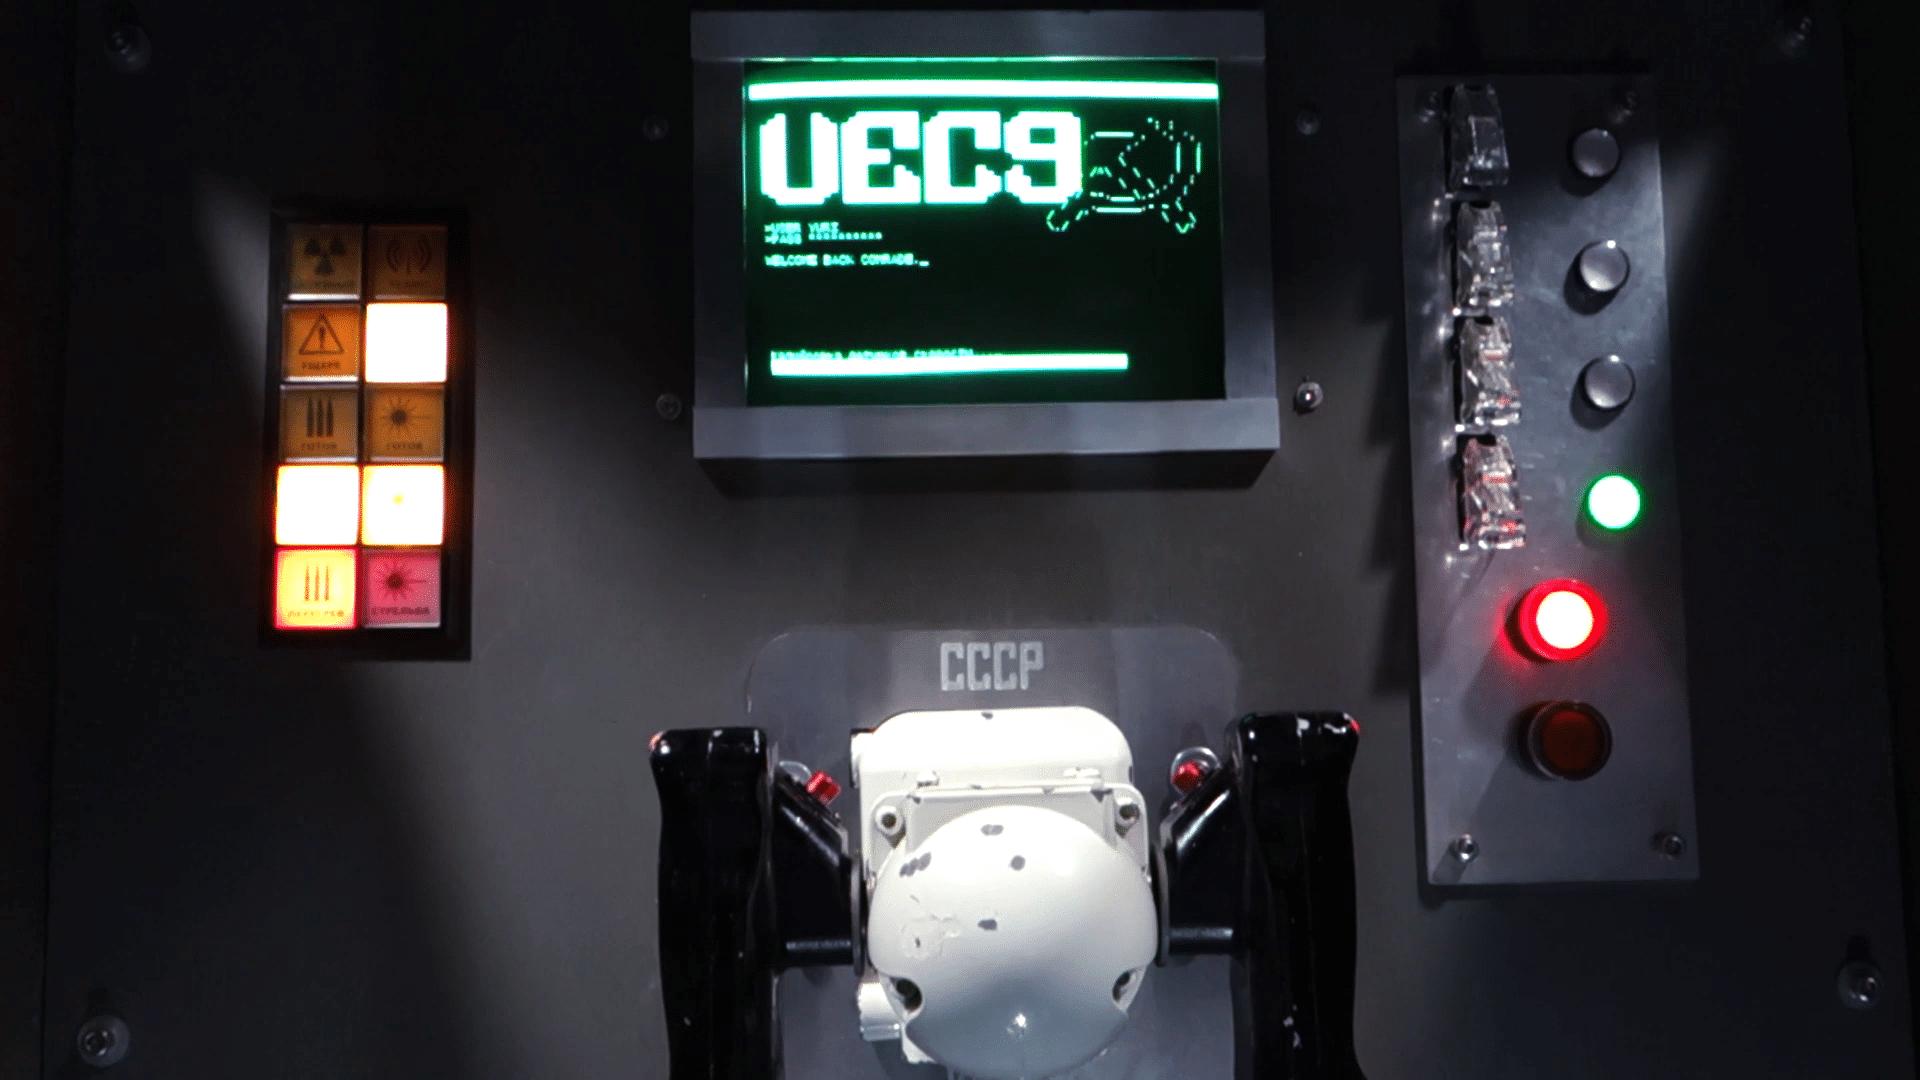 Der komplette Spielautomat. (Foto: vec9.com)